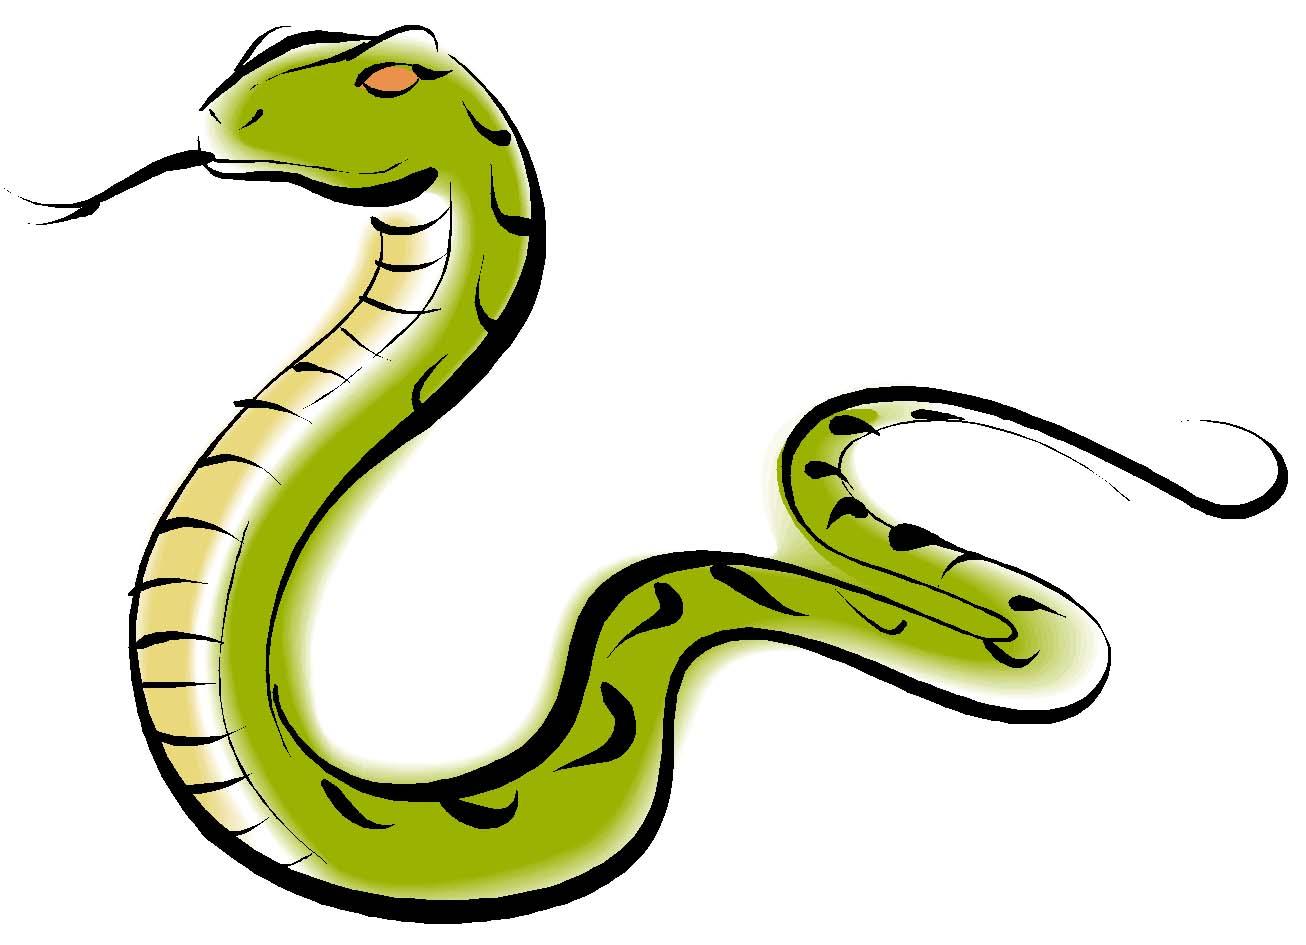 Anaconda clipart green snake Anaconda Download Anaconda Clipart Snake